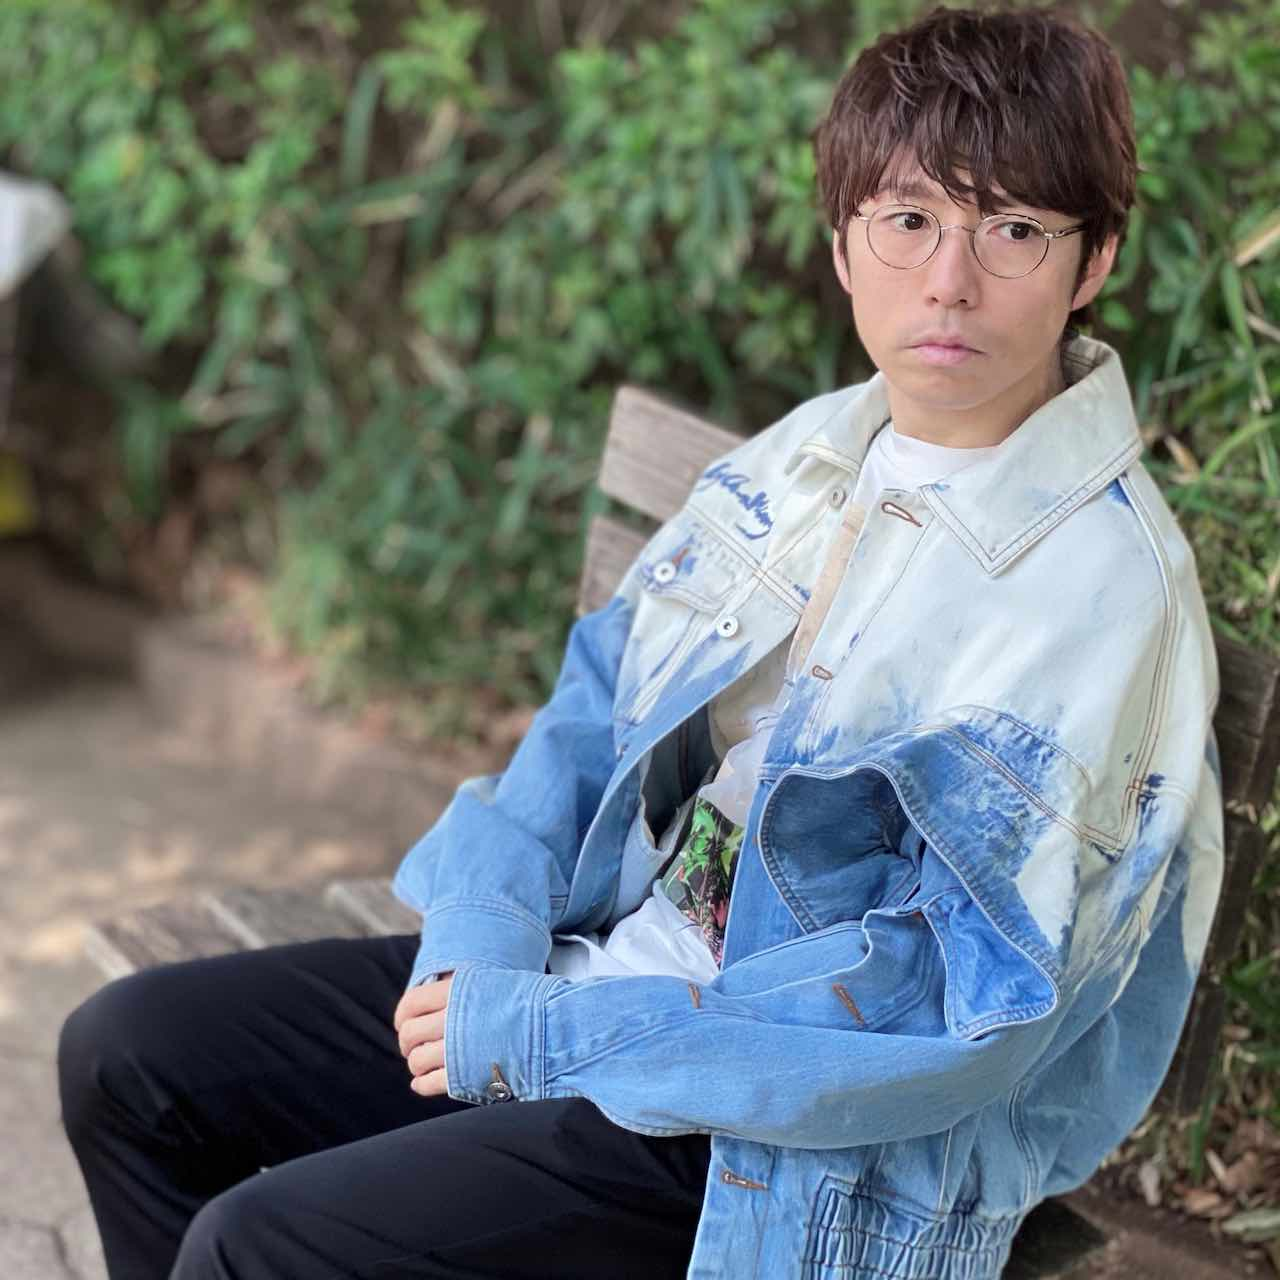 高橋優、全国26会場29公演に渡る全国ツアー開催決定!